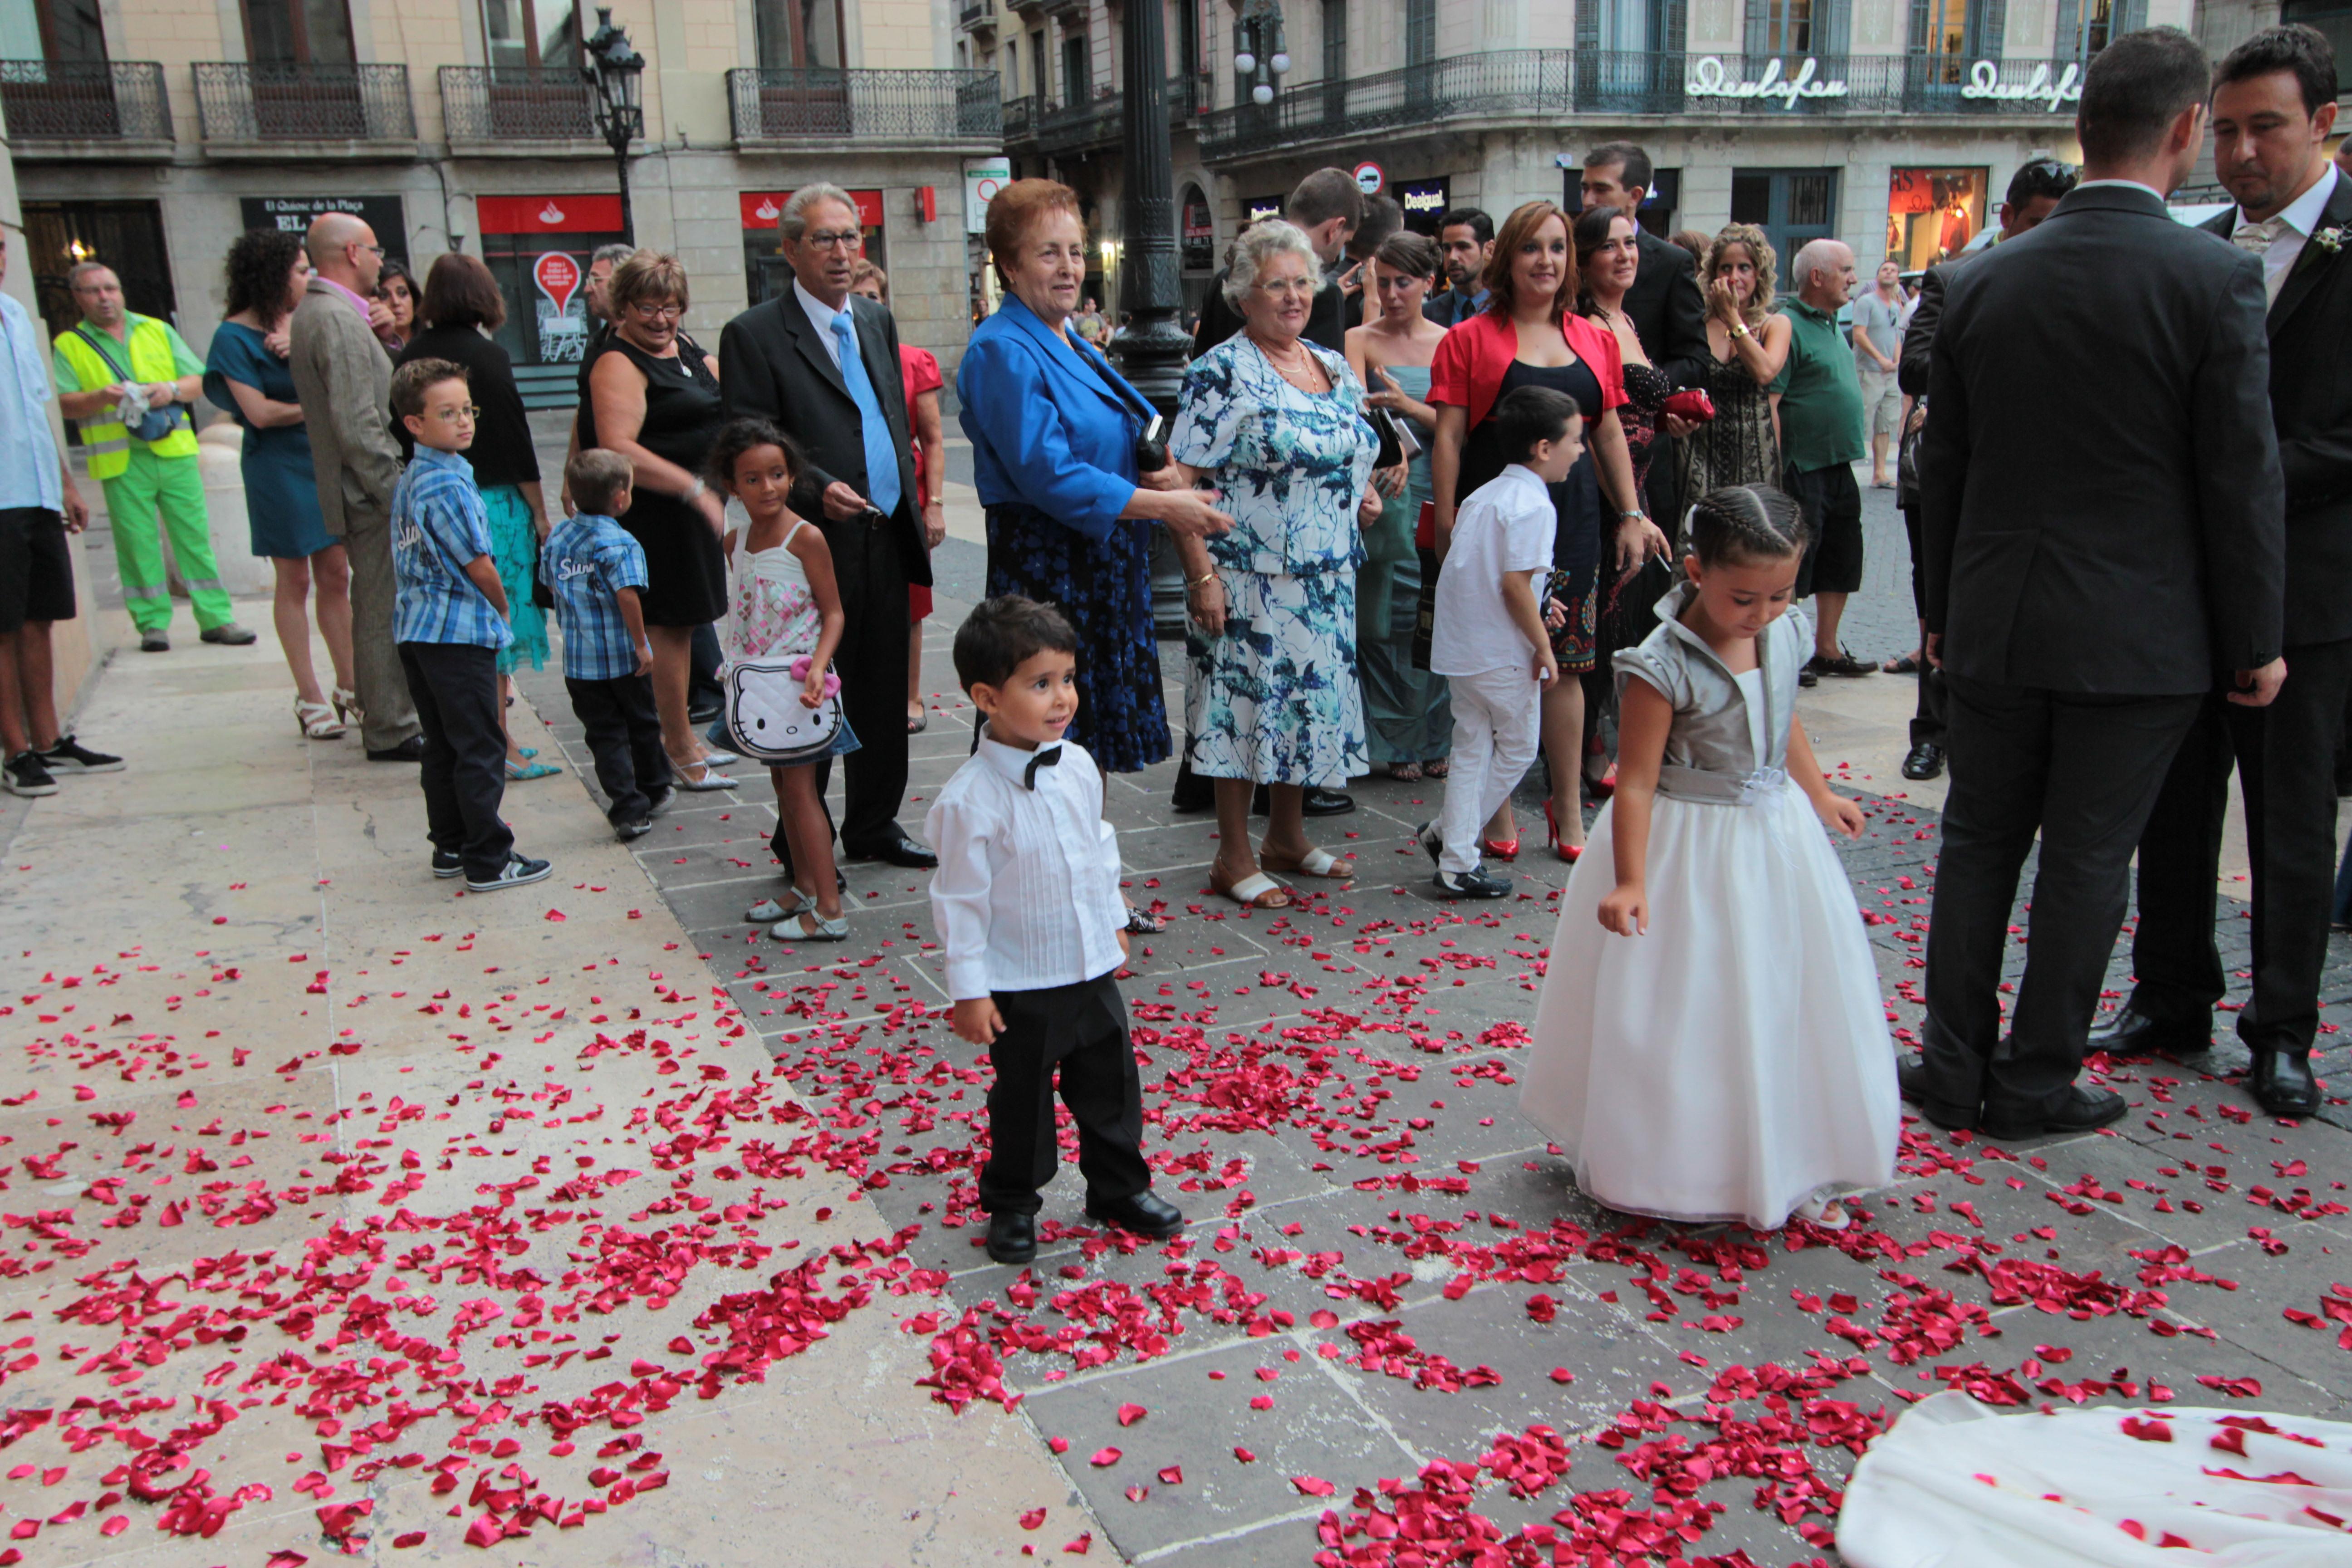 Joe Dobrow photo of a wedding in Barcelona